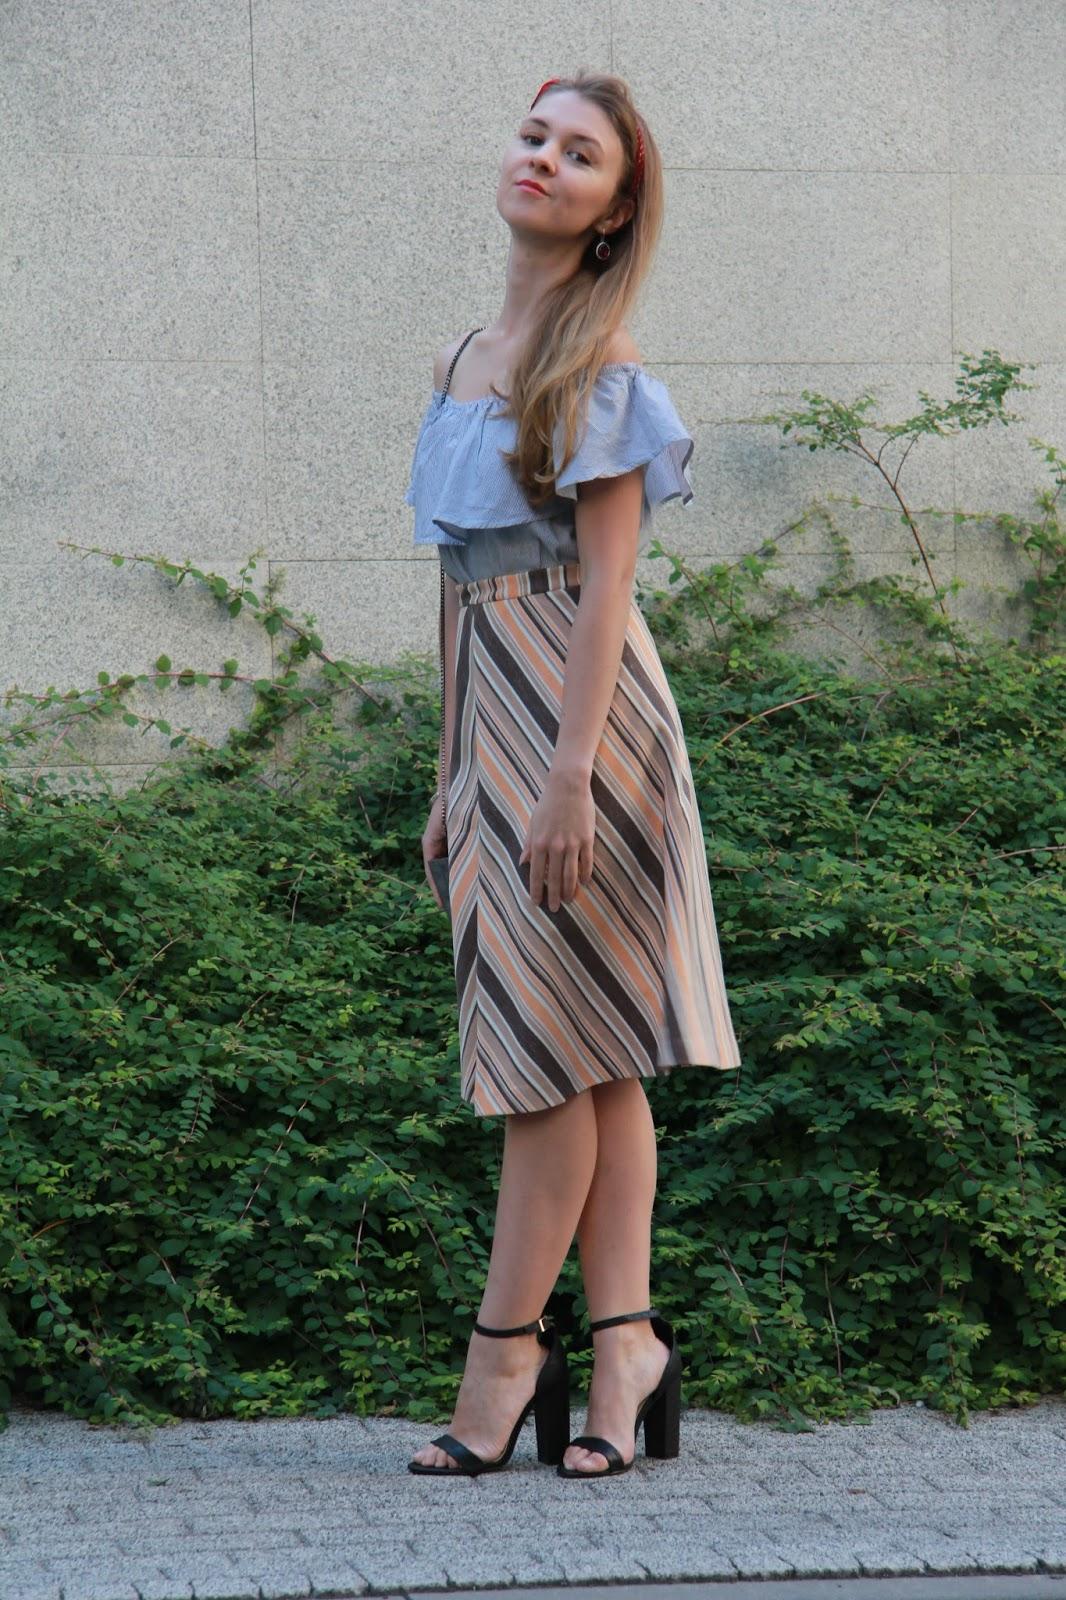 Retro #outfit #vintage